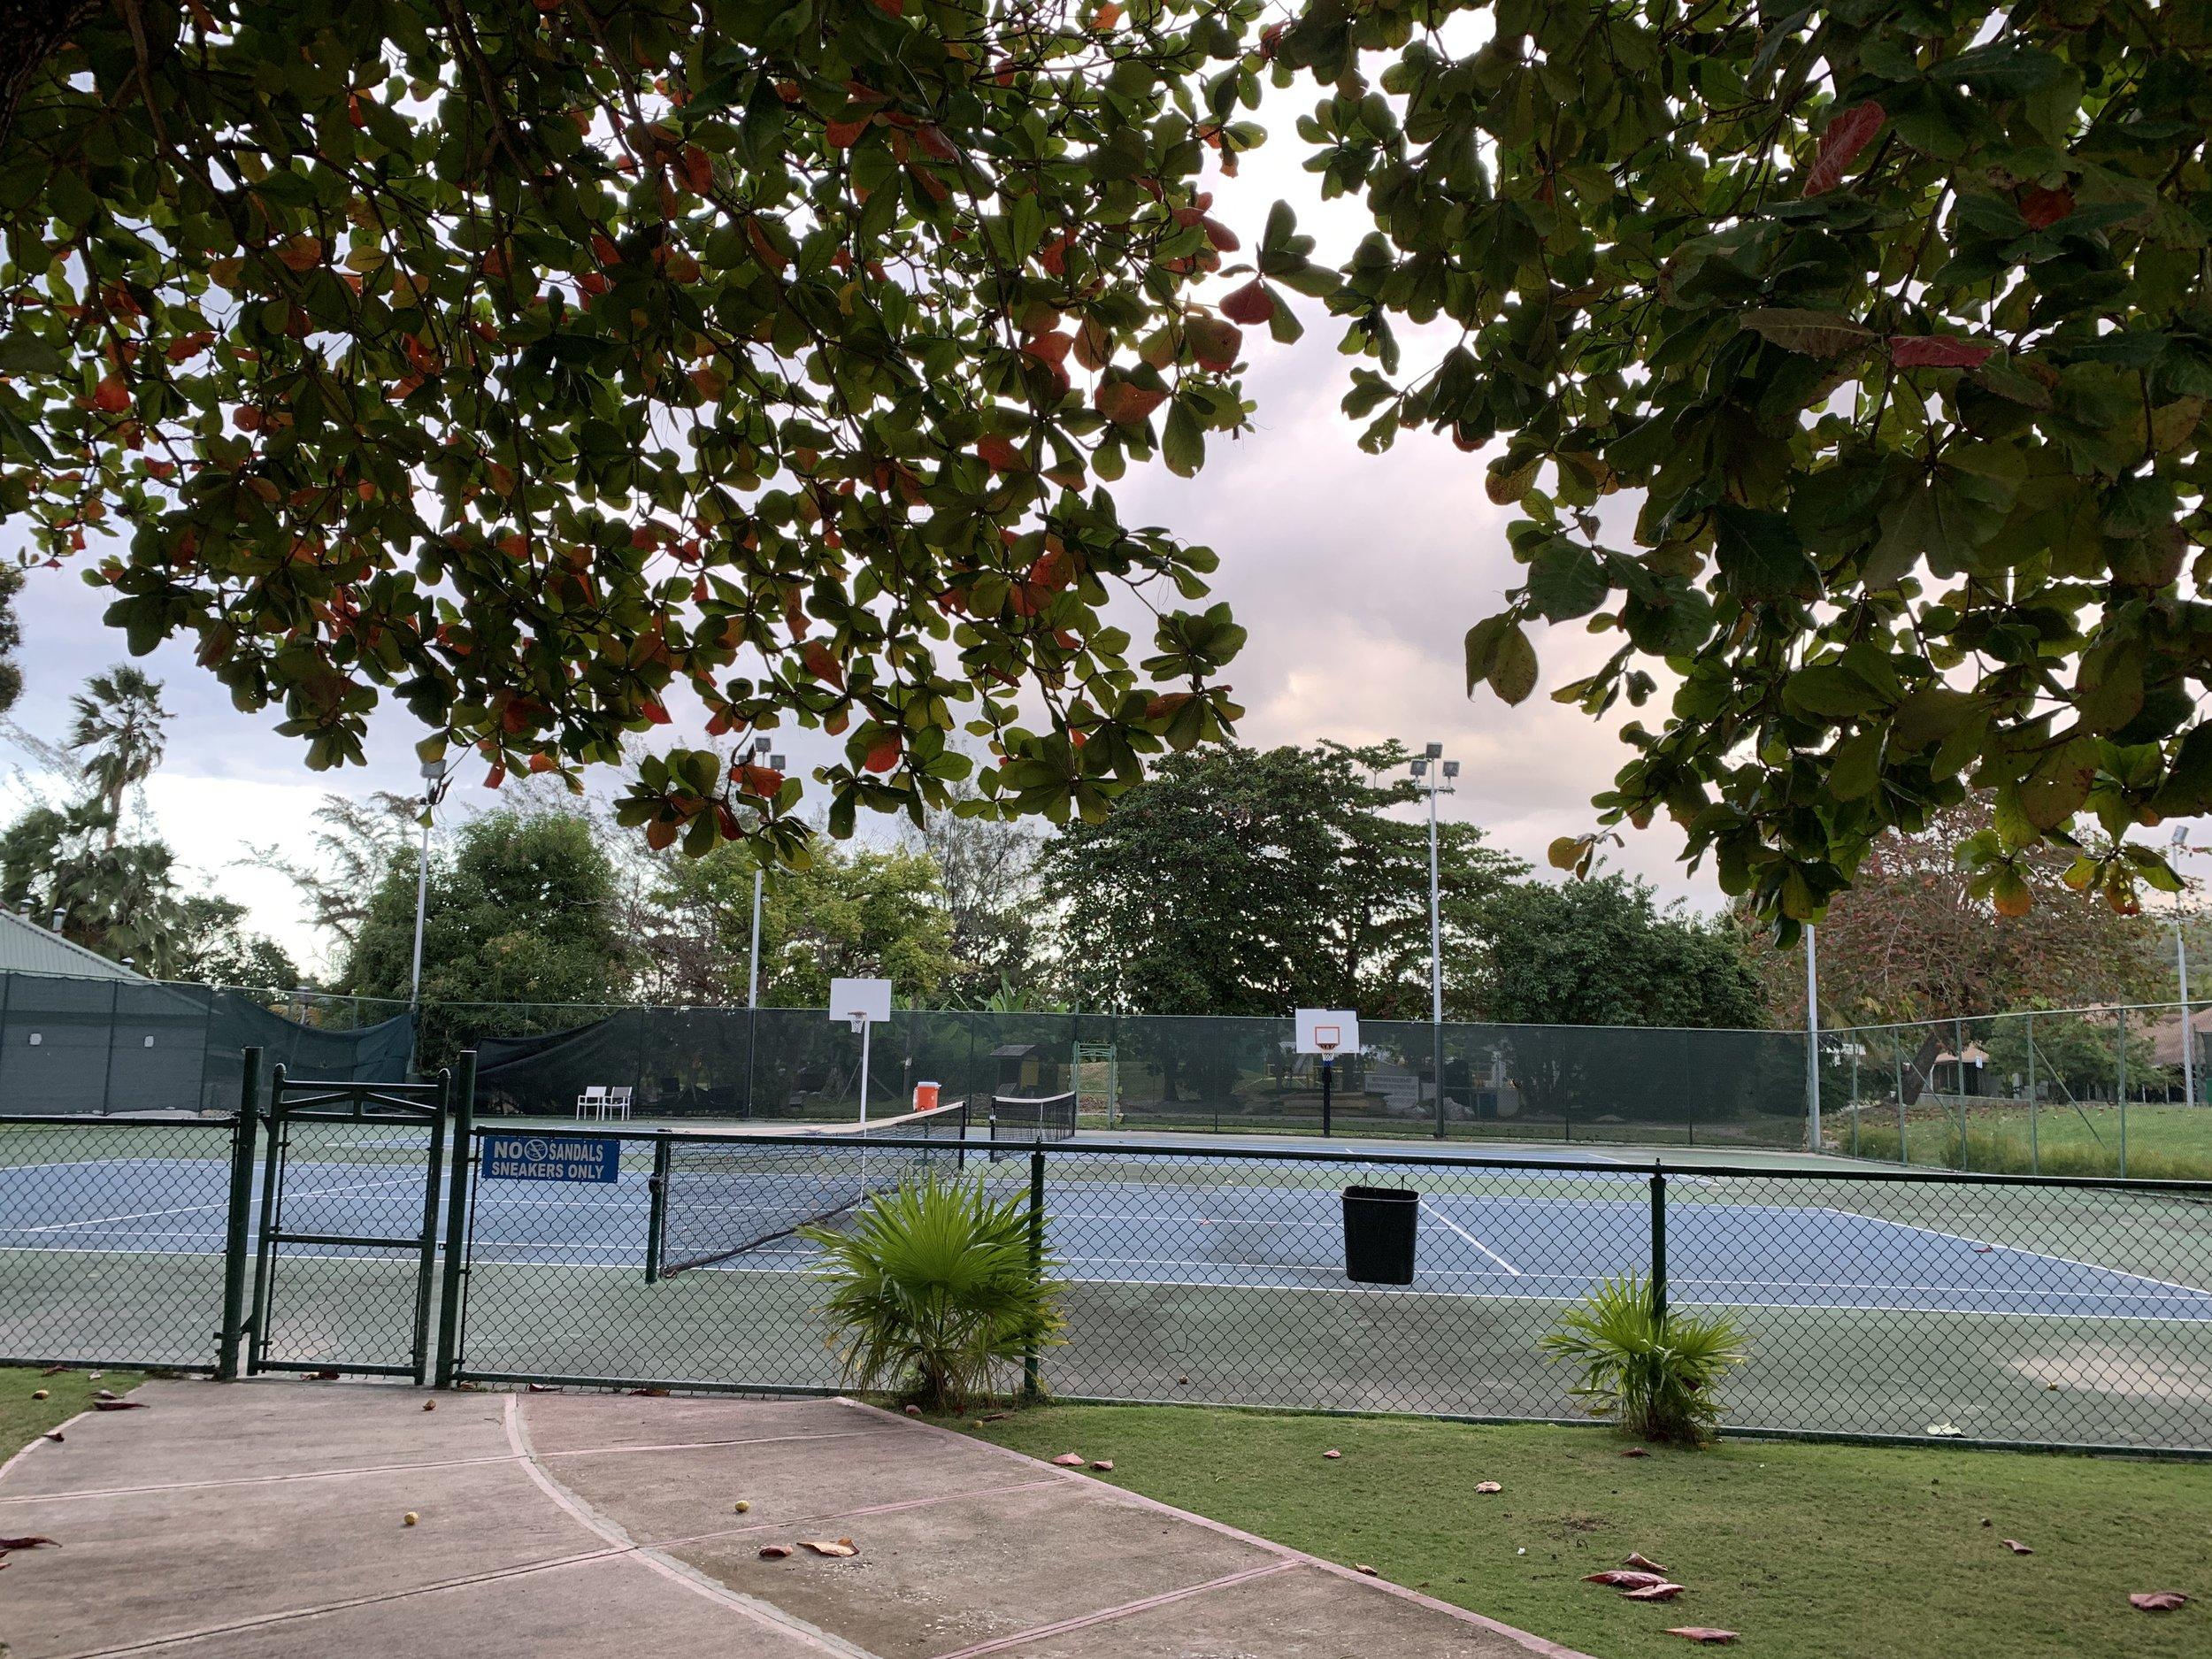 Their basketball/tennis court